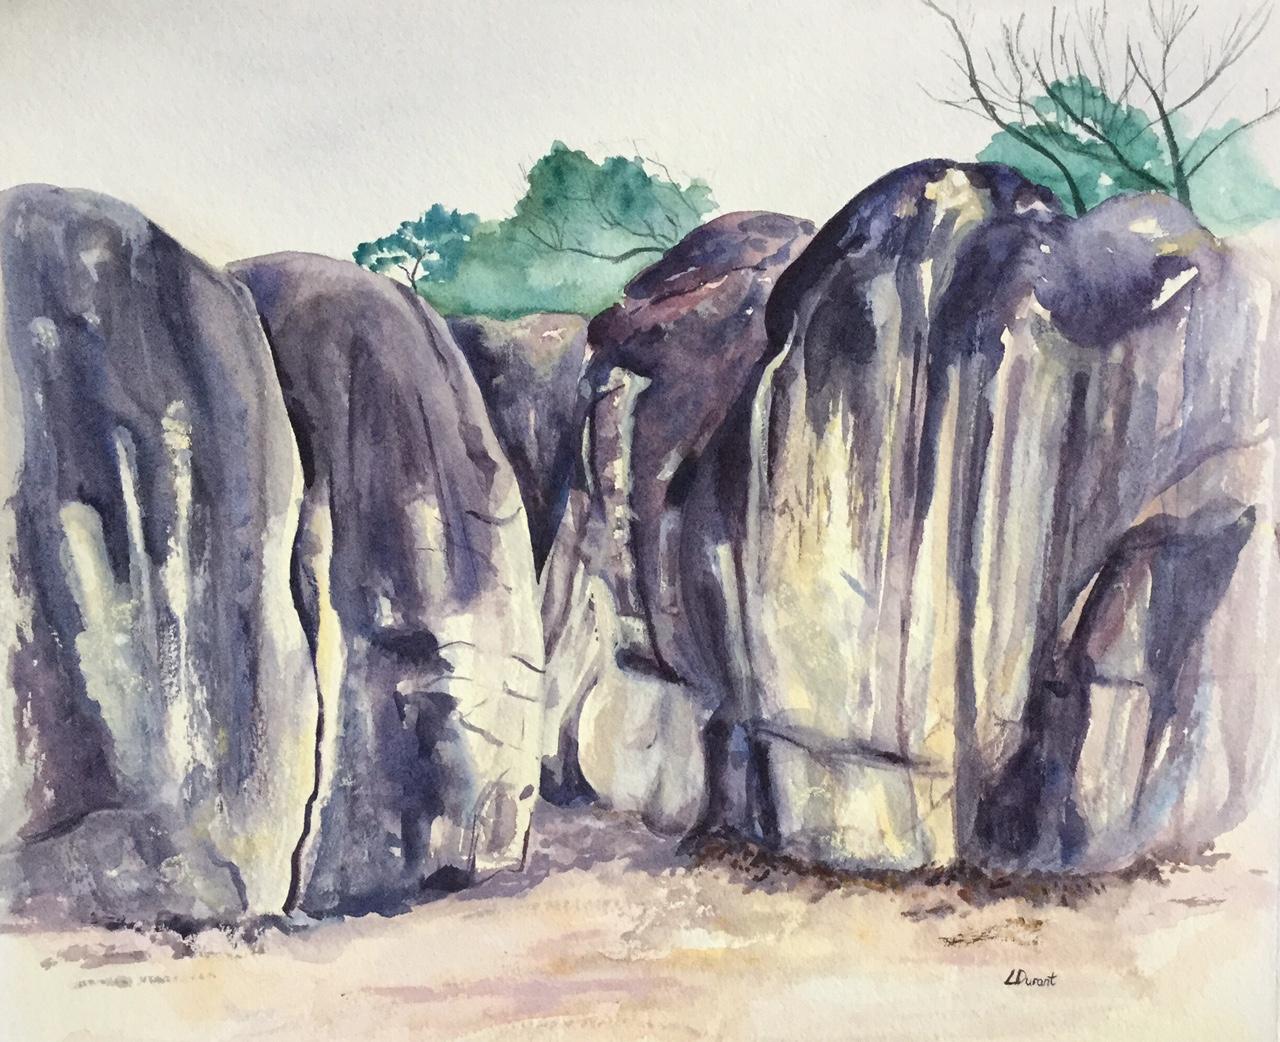 Bas Cuvier boulders